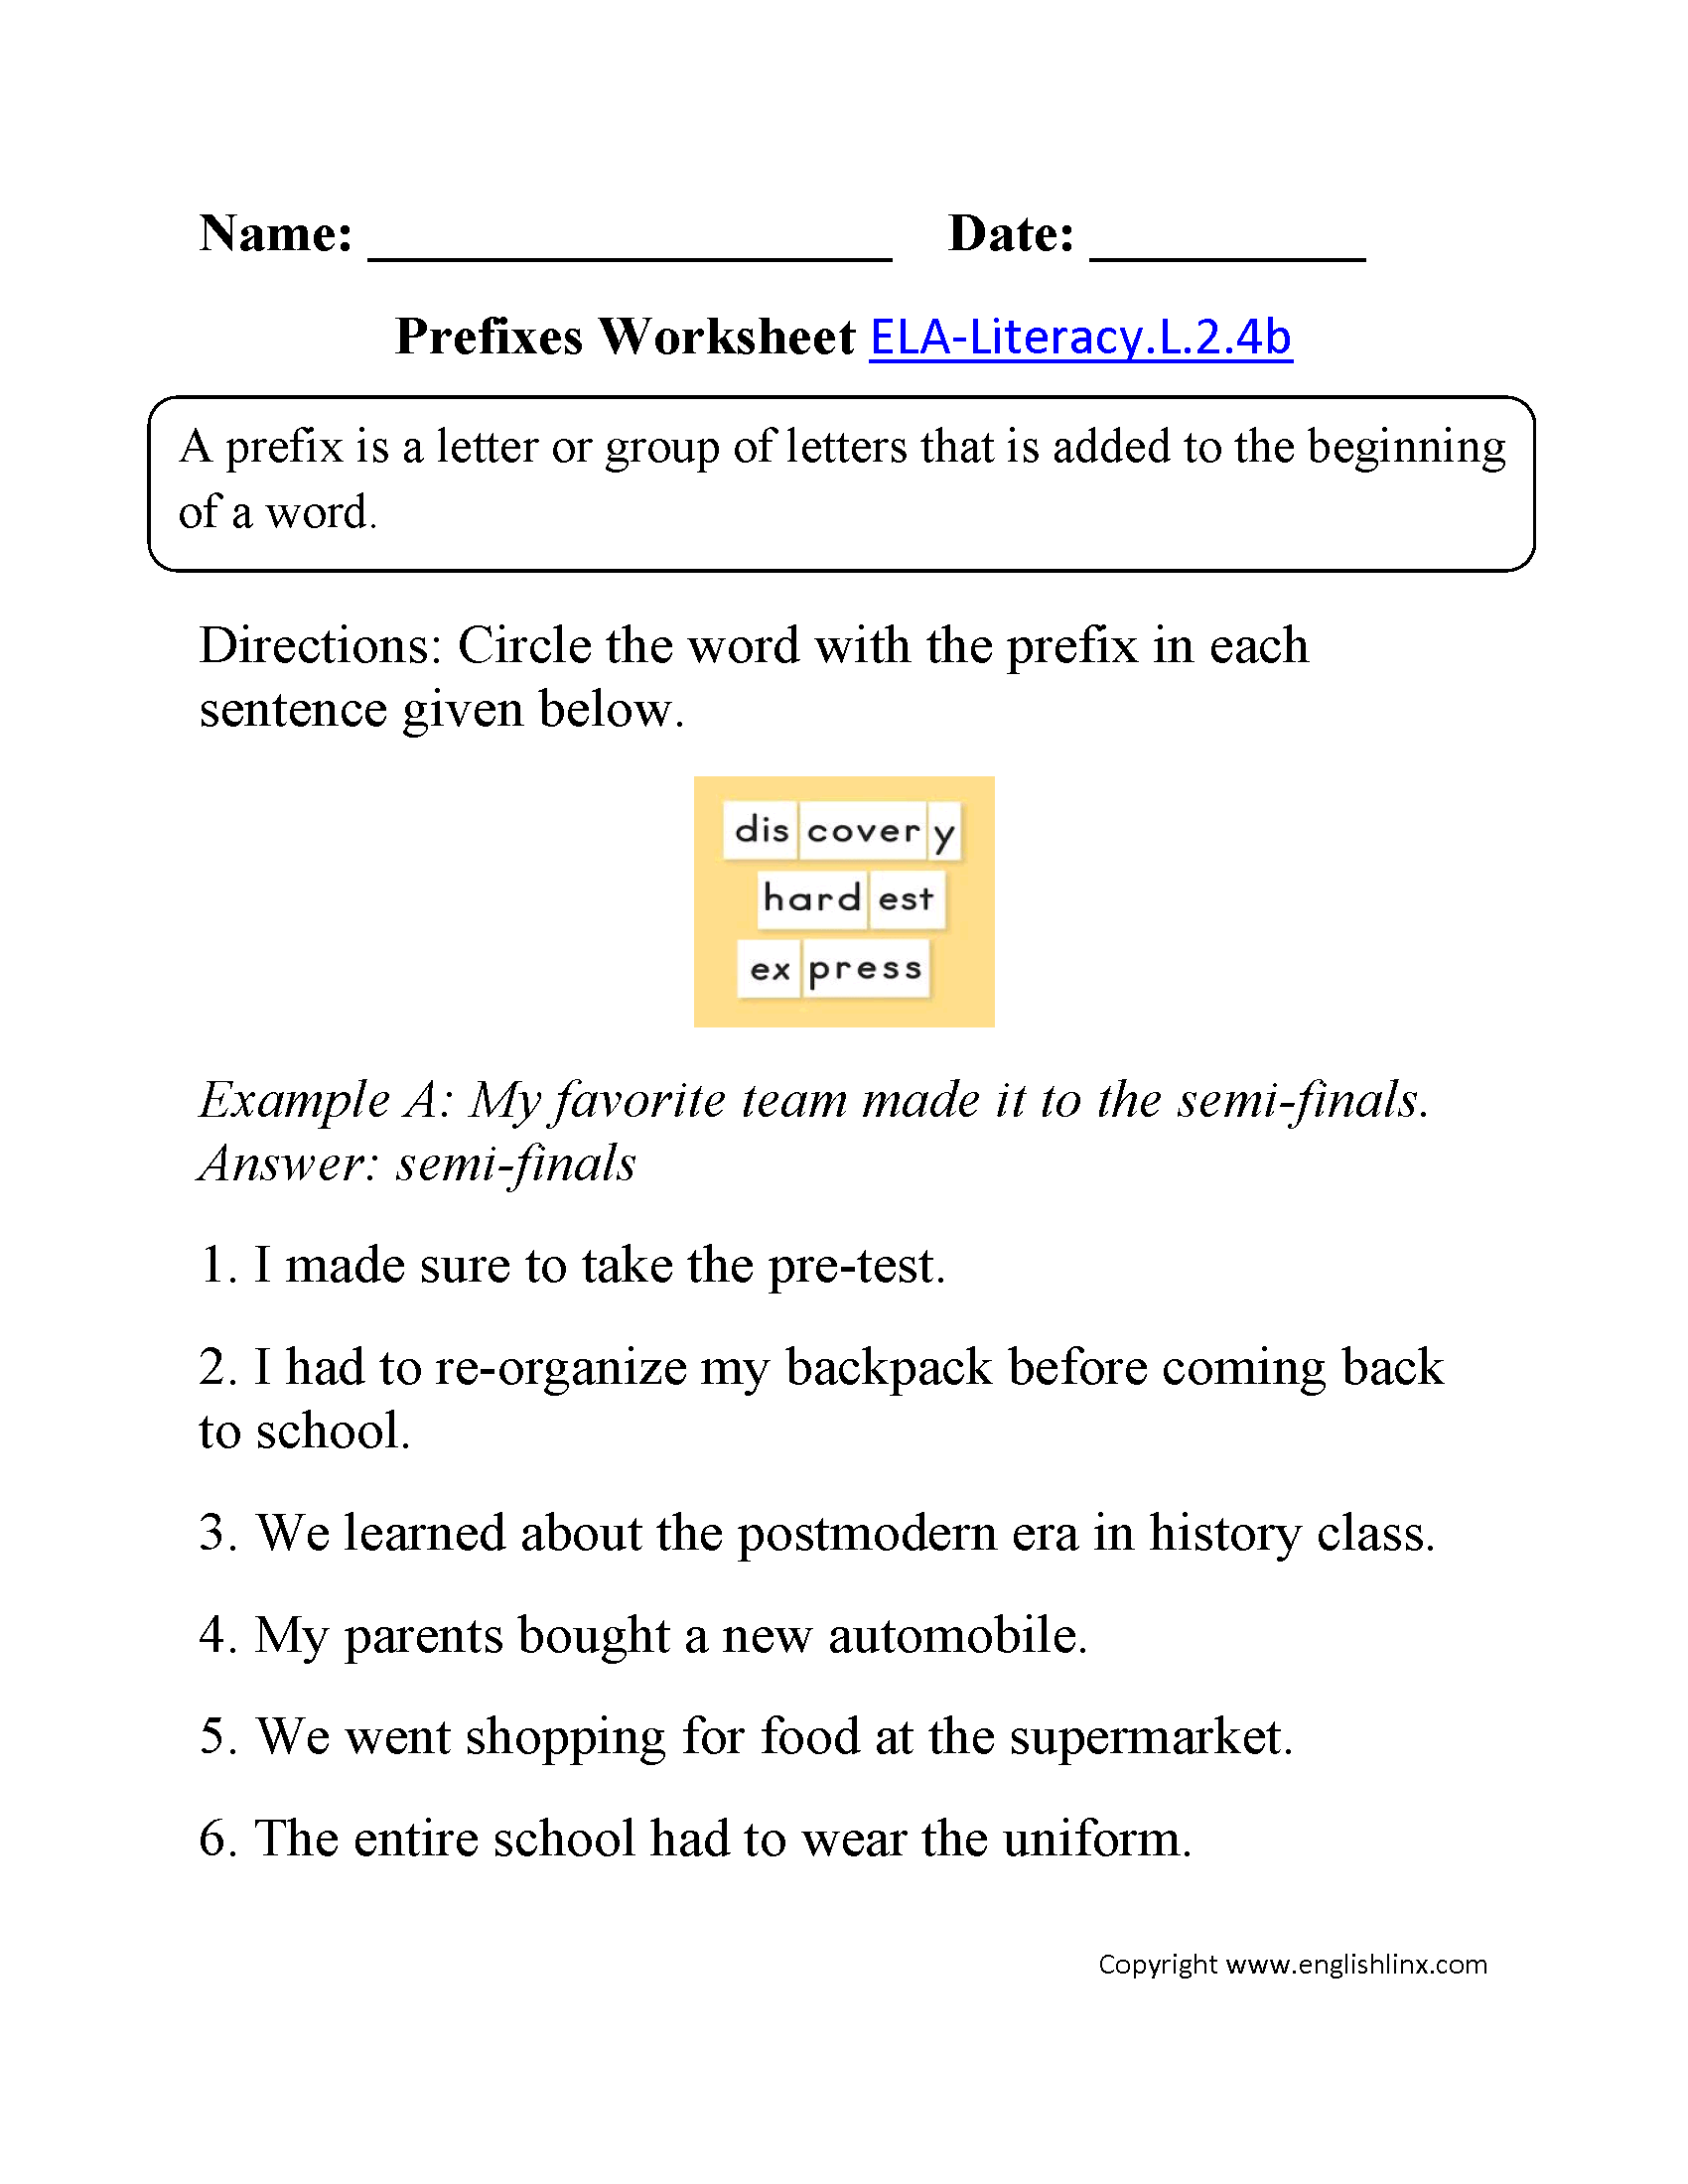 Prefixes Worksheet 2 Ela Literacy L 2 4b Language